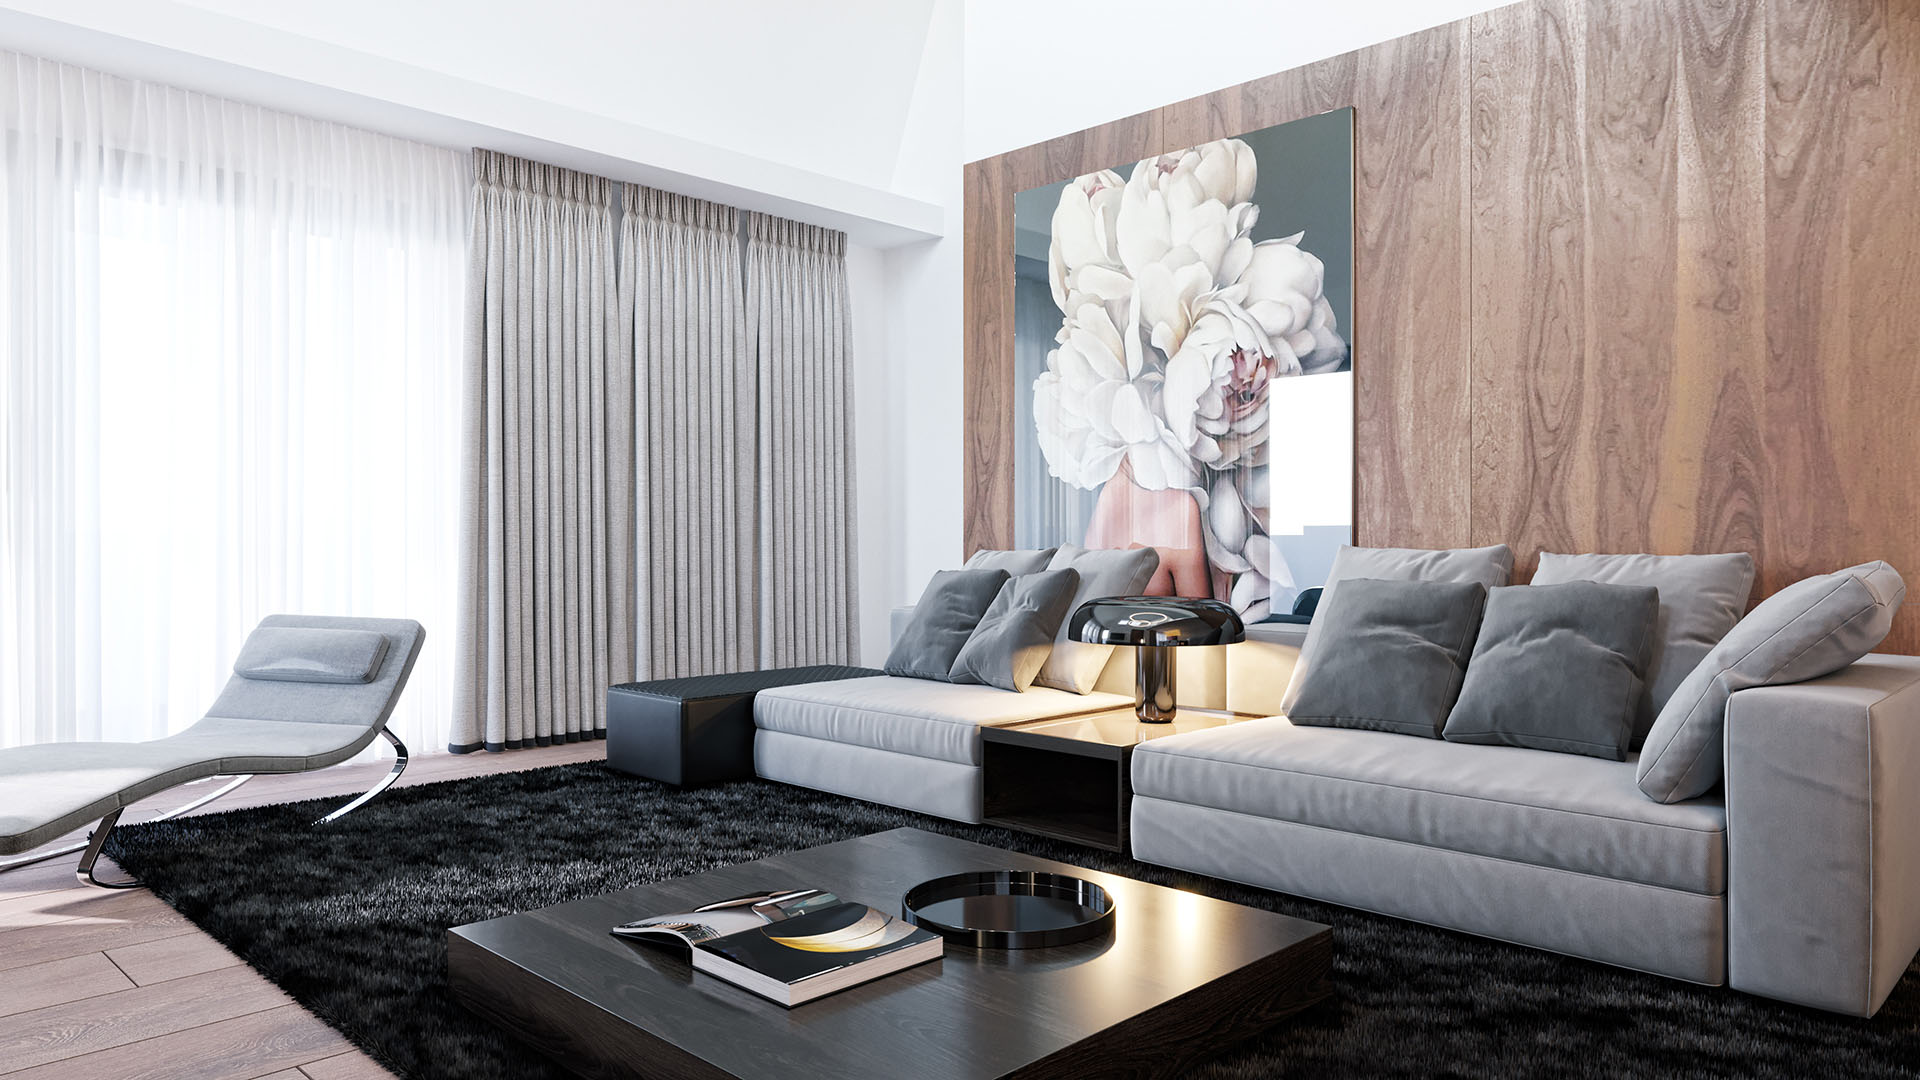 Sunset Lake Homes - propunere amenajare apartament 1